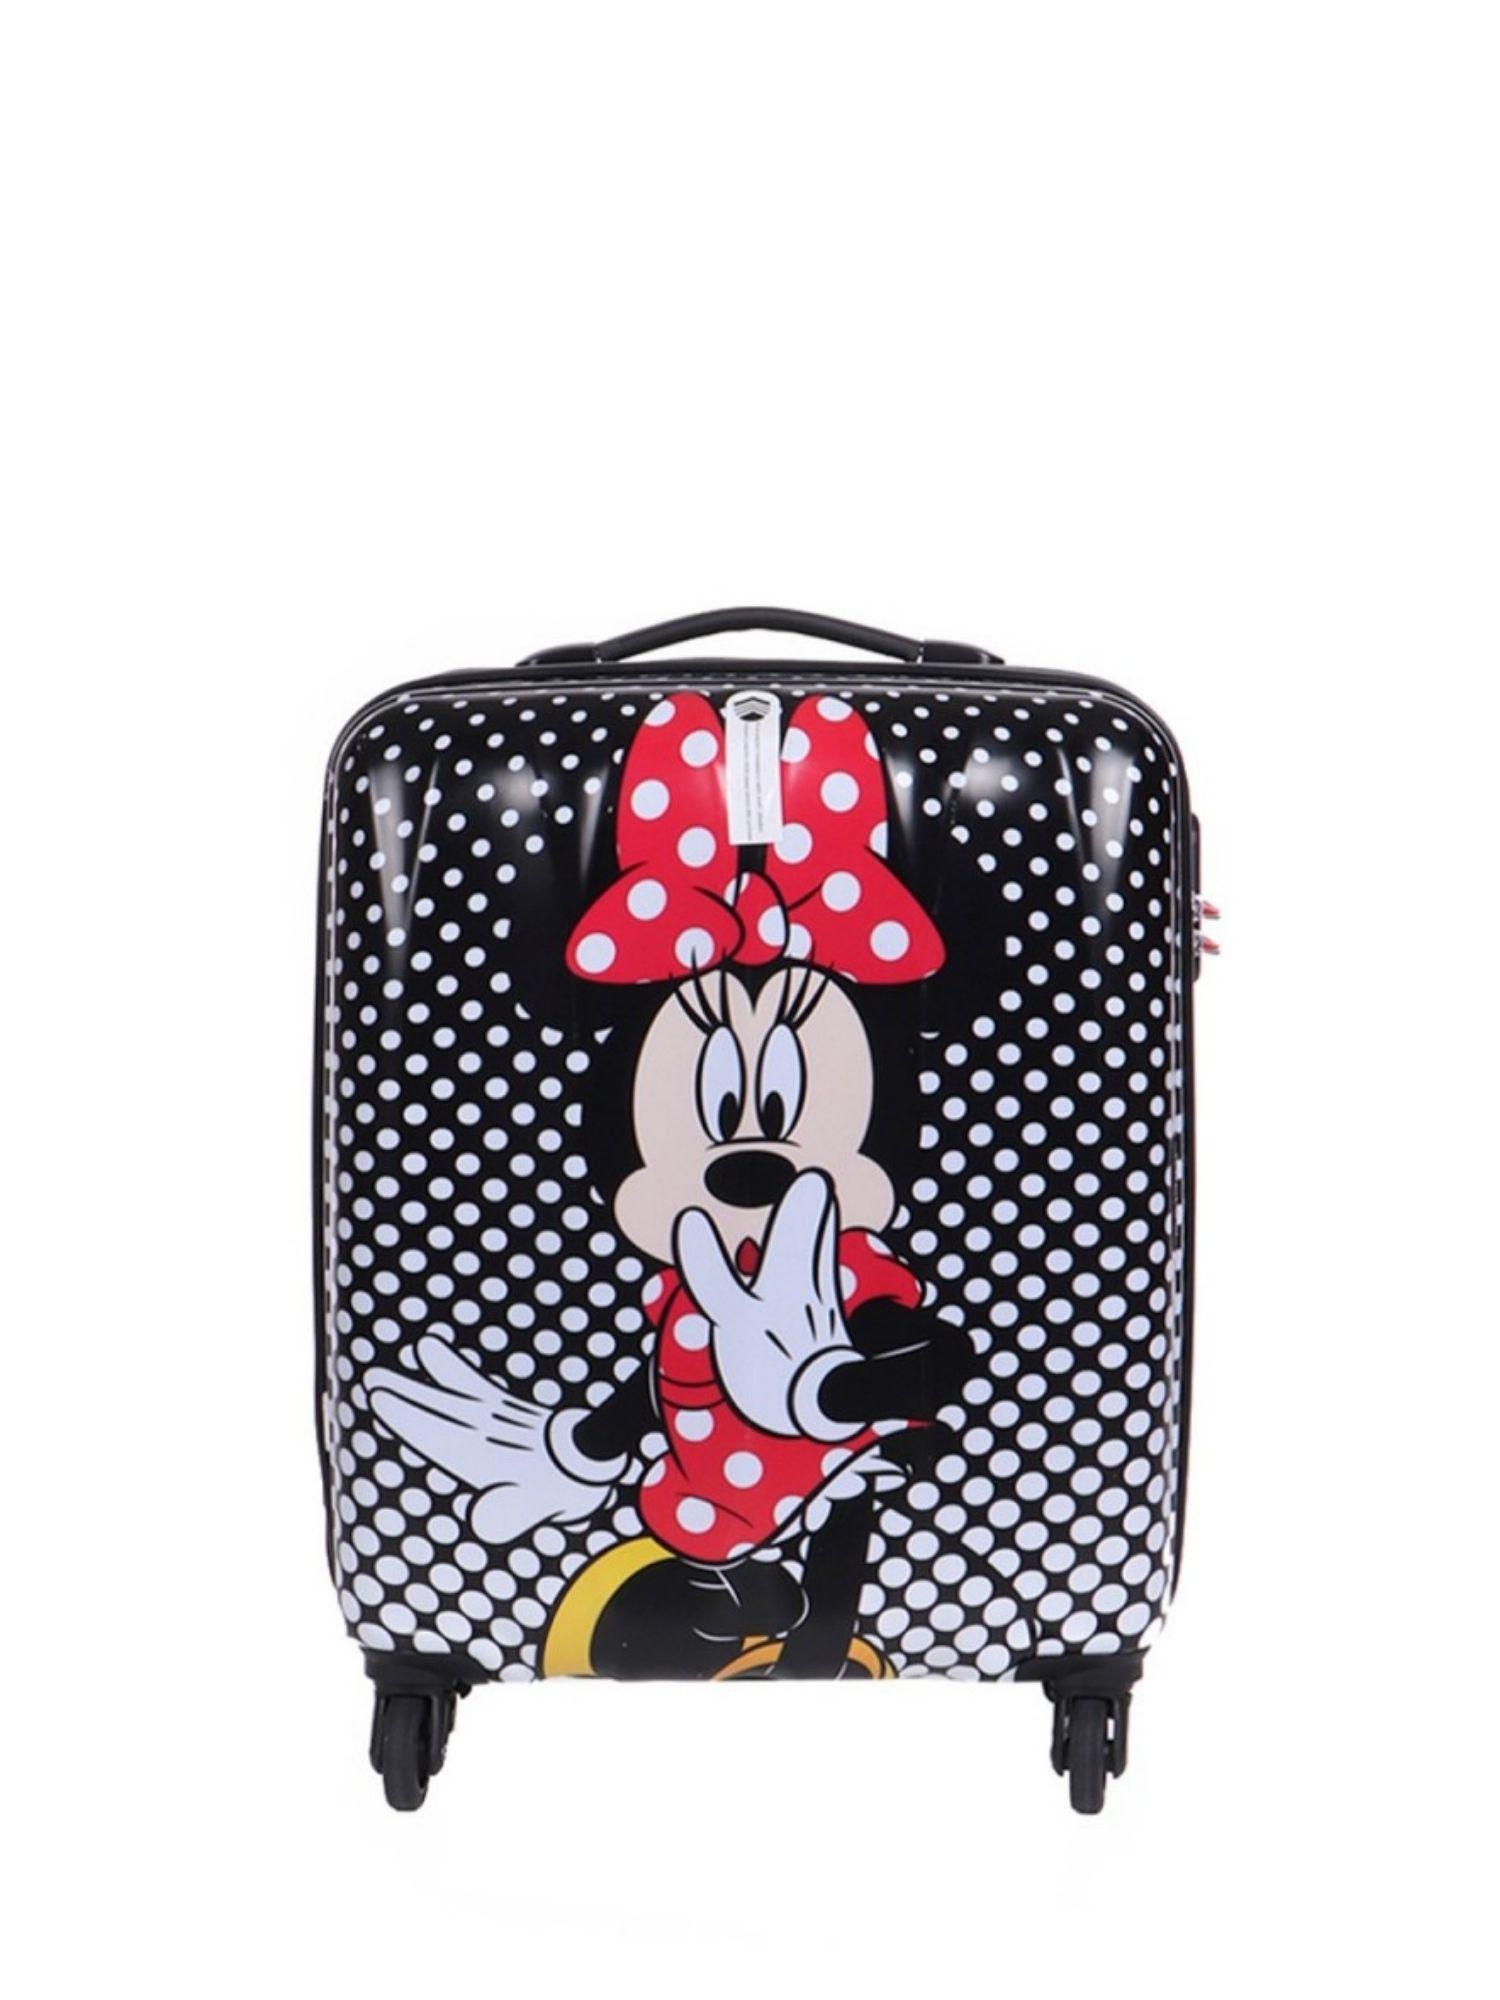 Trolley 4 ruote 55 cm. Disney Legends Minnie Mouse Polka Dot